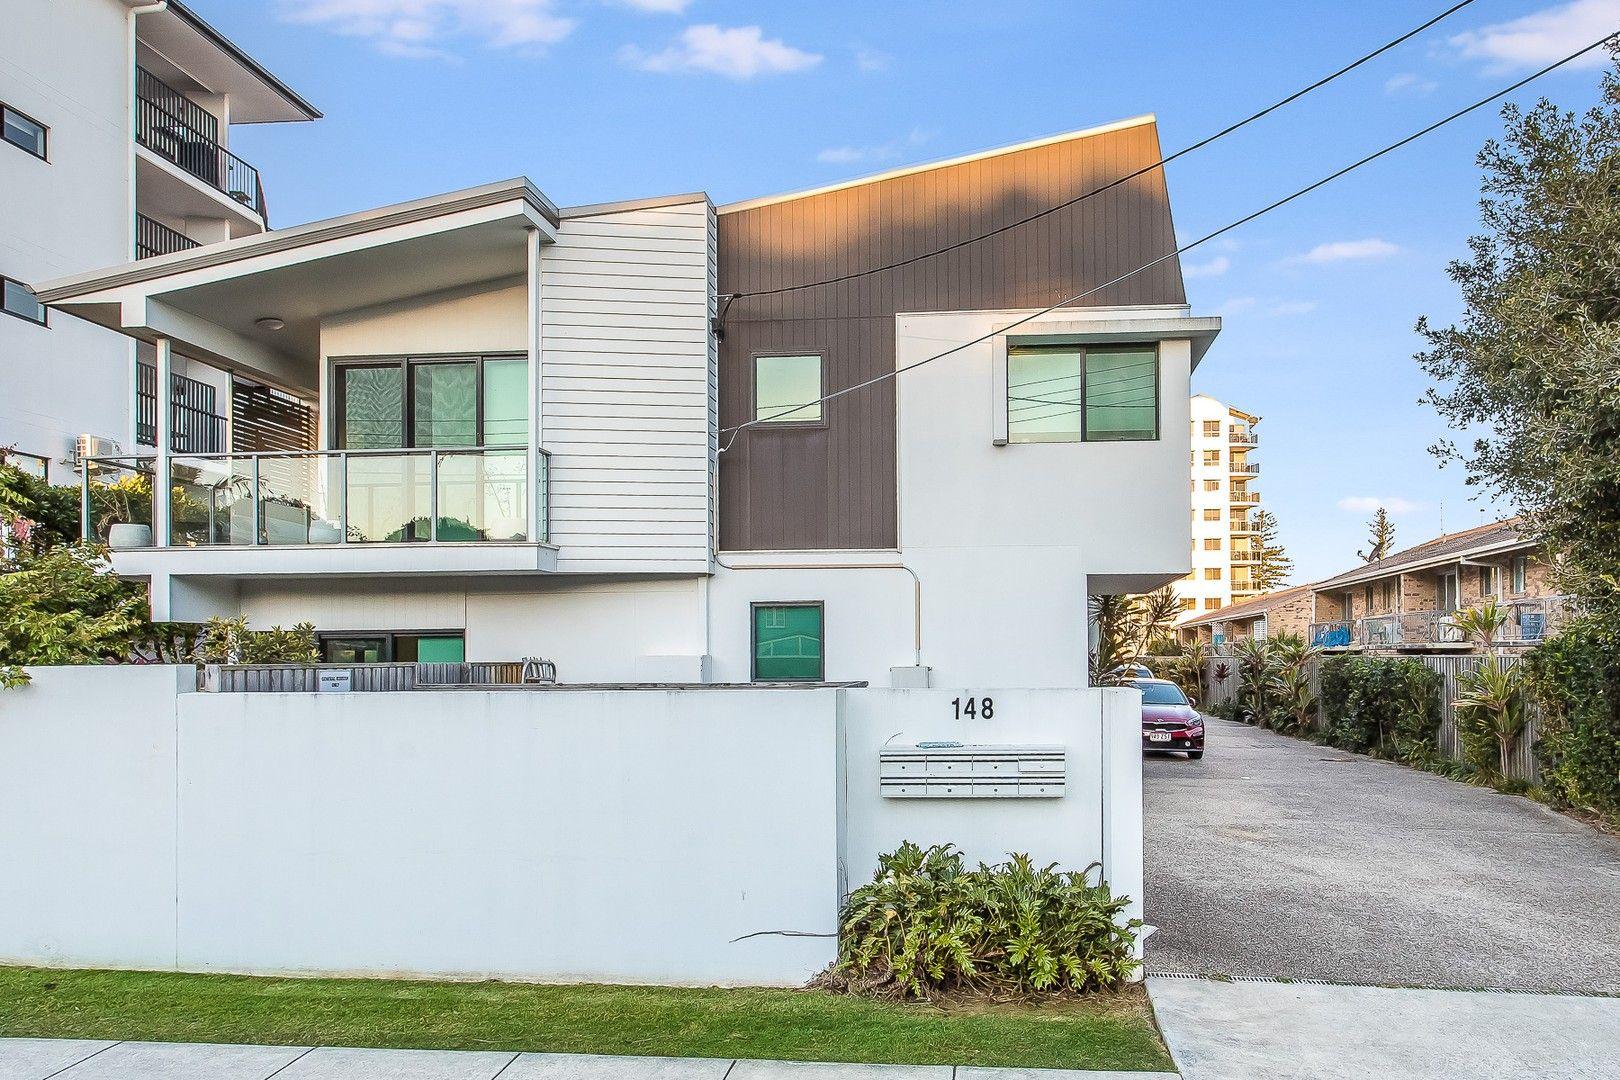 5/148 Mein Street, Scarborough QLD 4020, Image 0